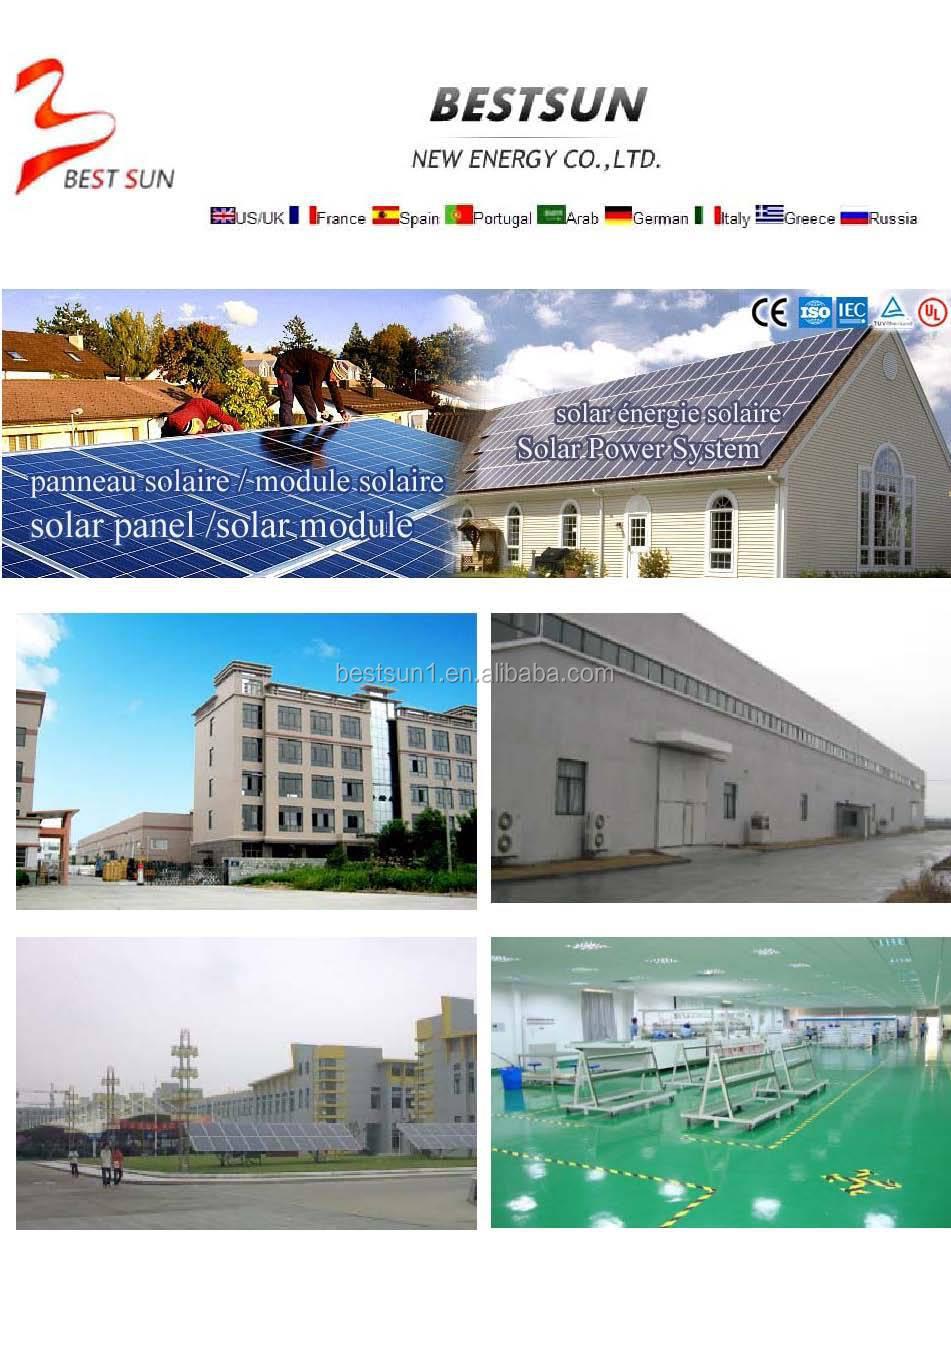 Wholesale Solar Panel Kits Complete Home Solar Power System Home - Home solar power system design